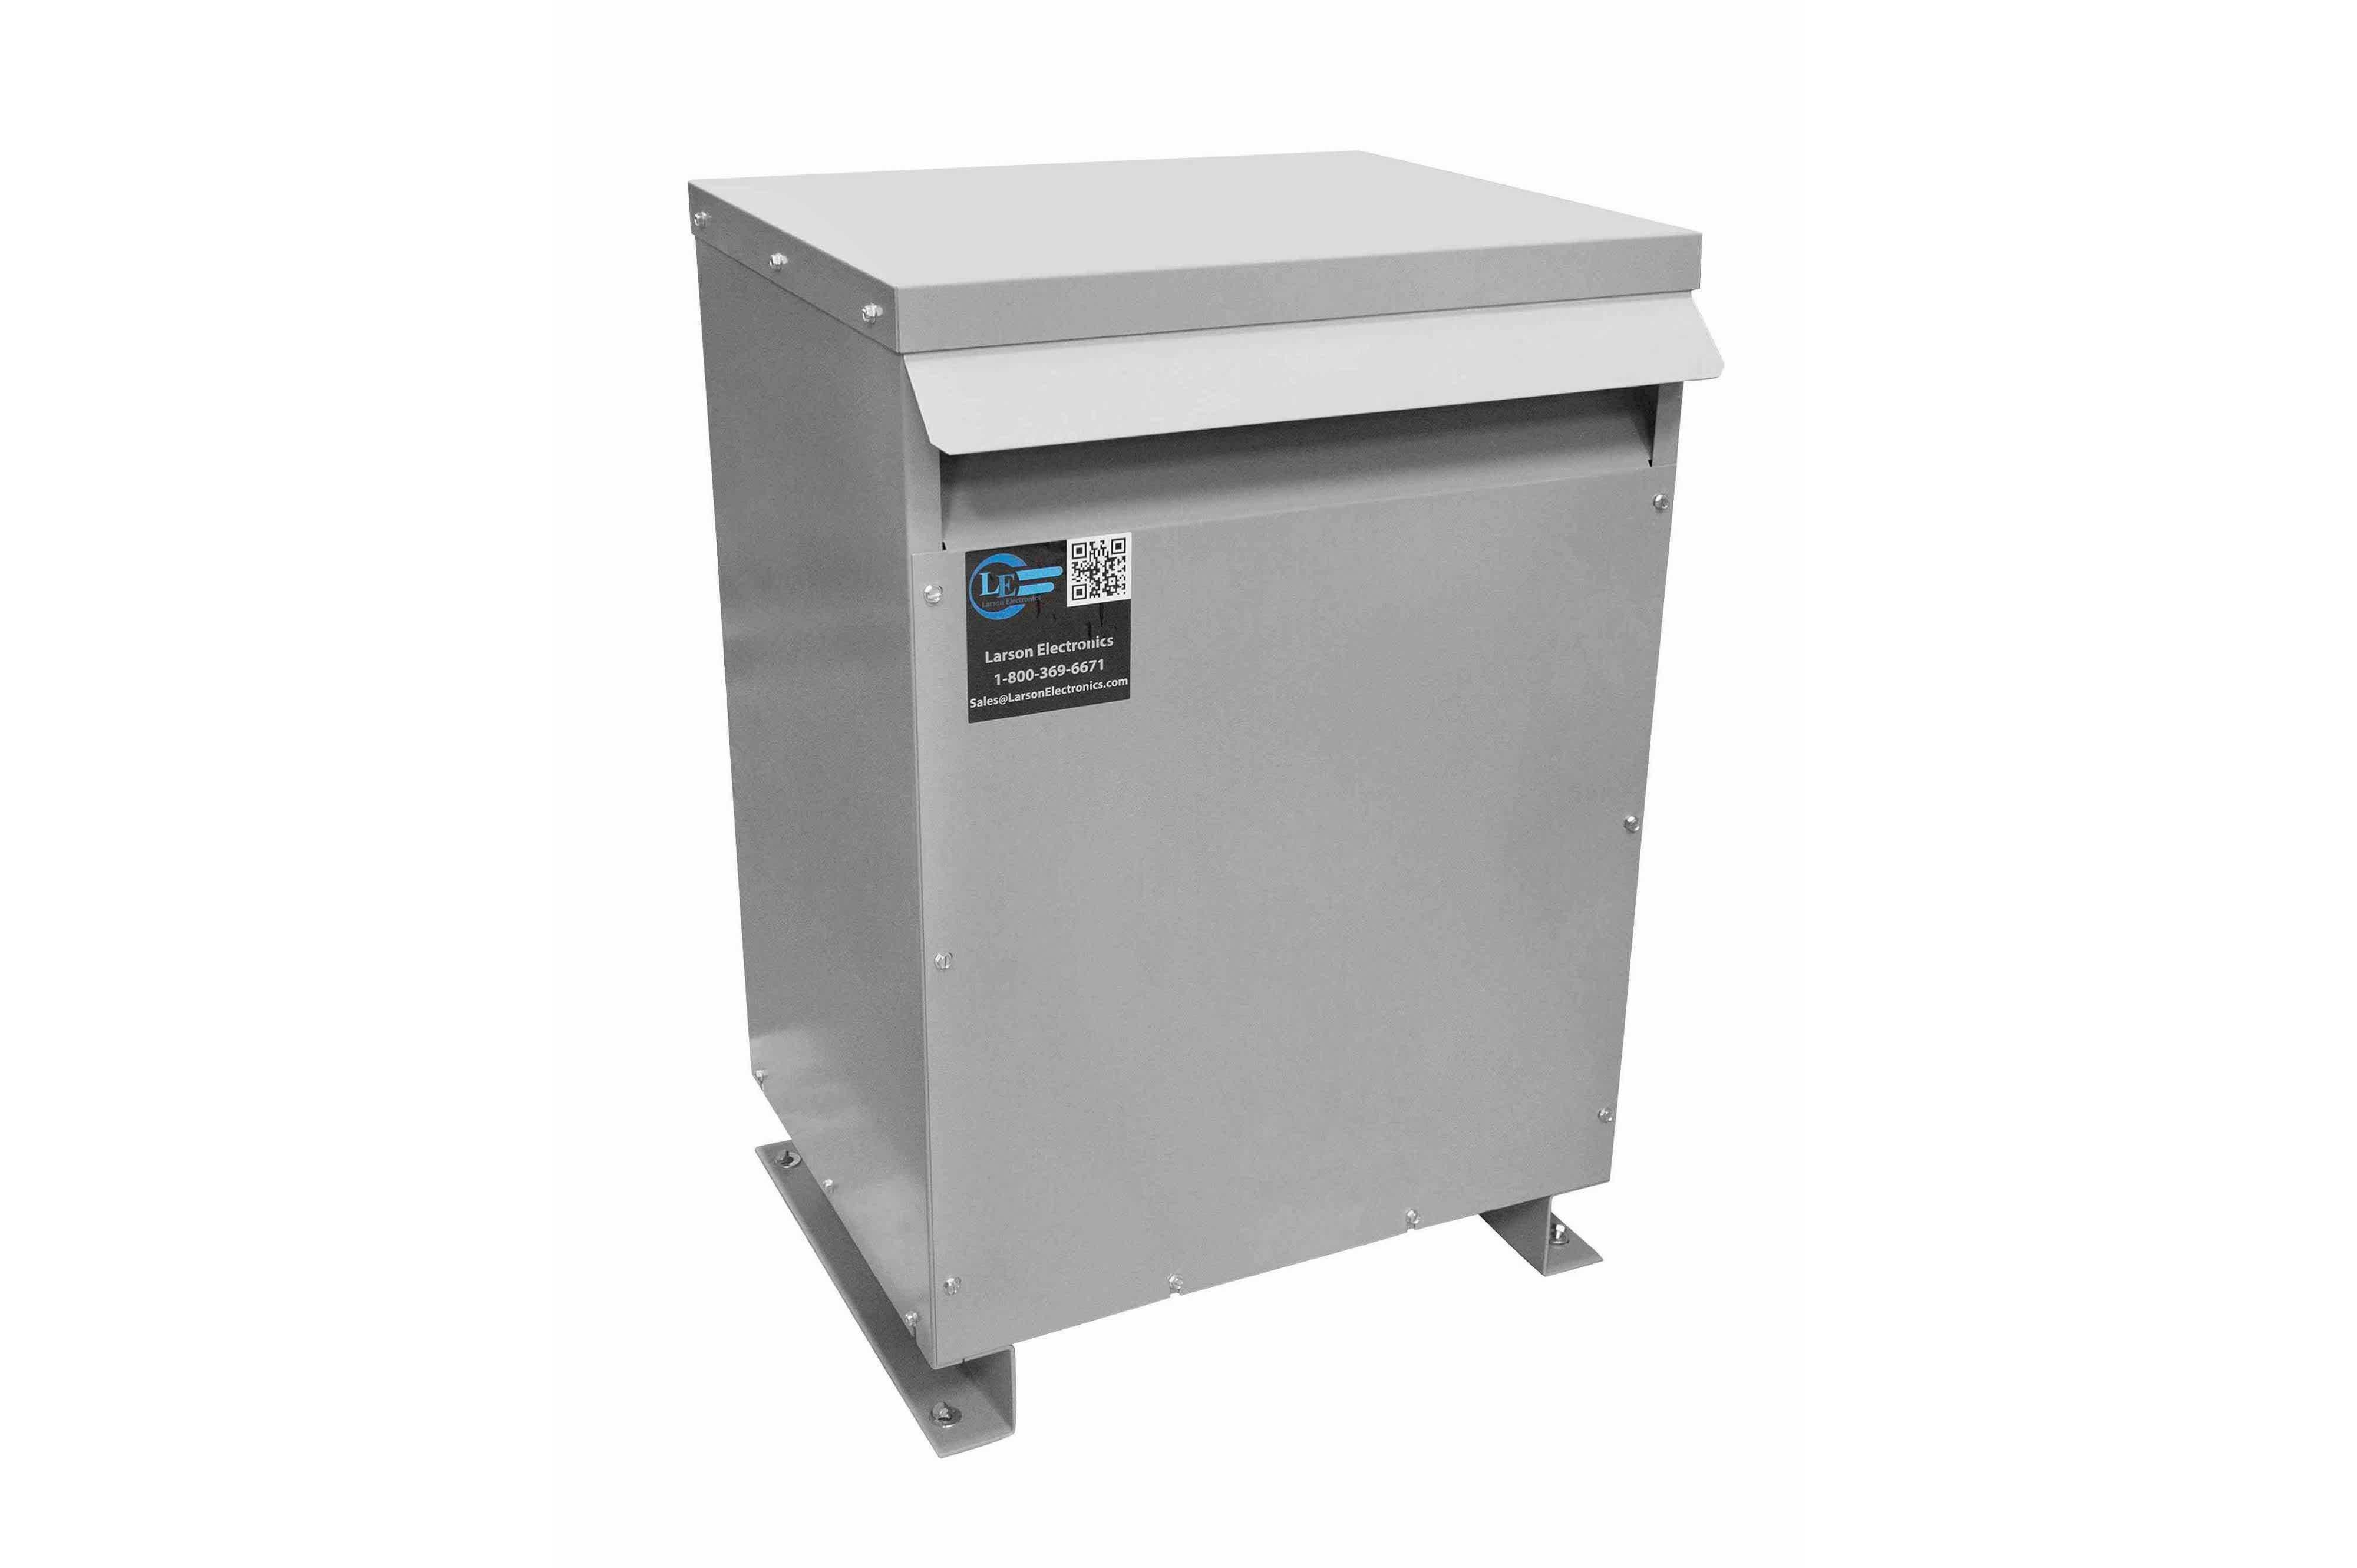 47.5 kVA 3PH Isolation Transformer, 380V Wye Primary, 480V Delta Secondary, N3R, Ventilated, 60 Hz